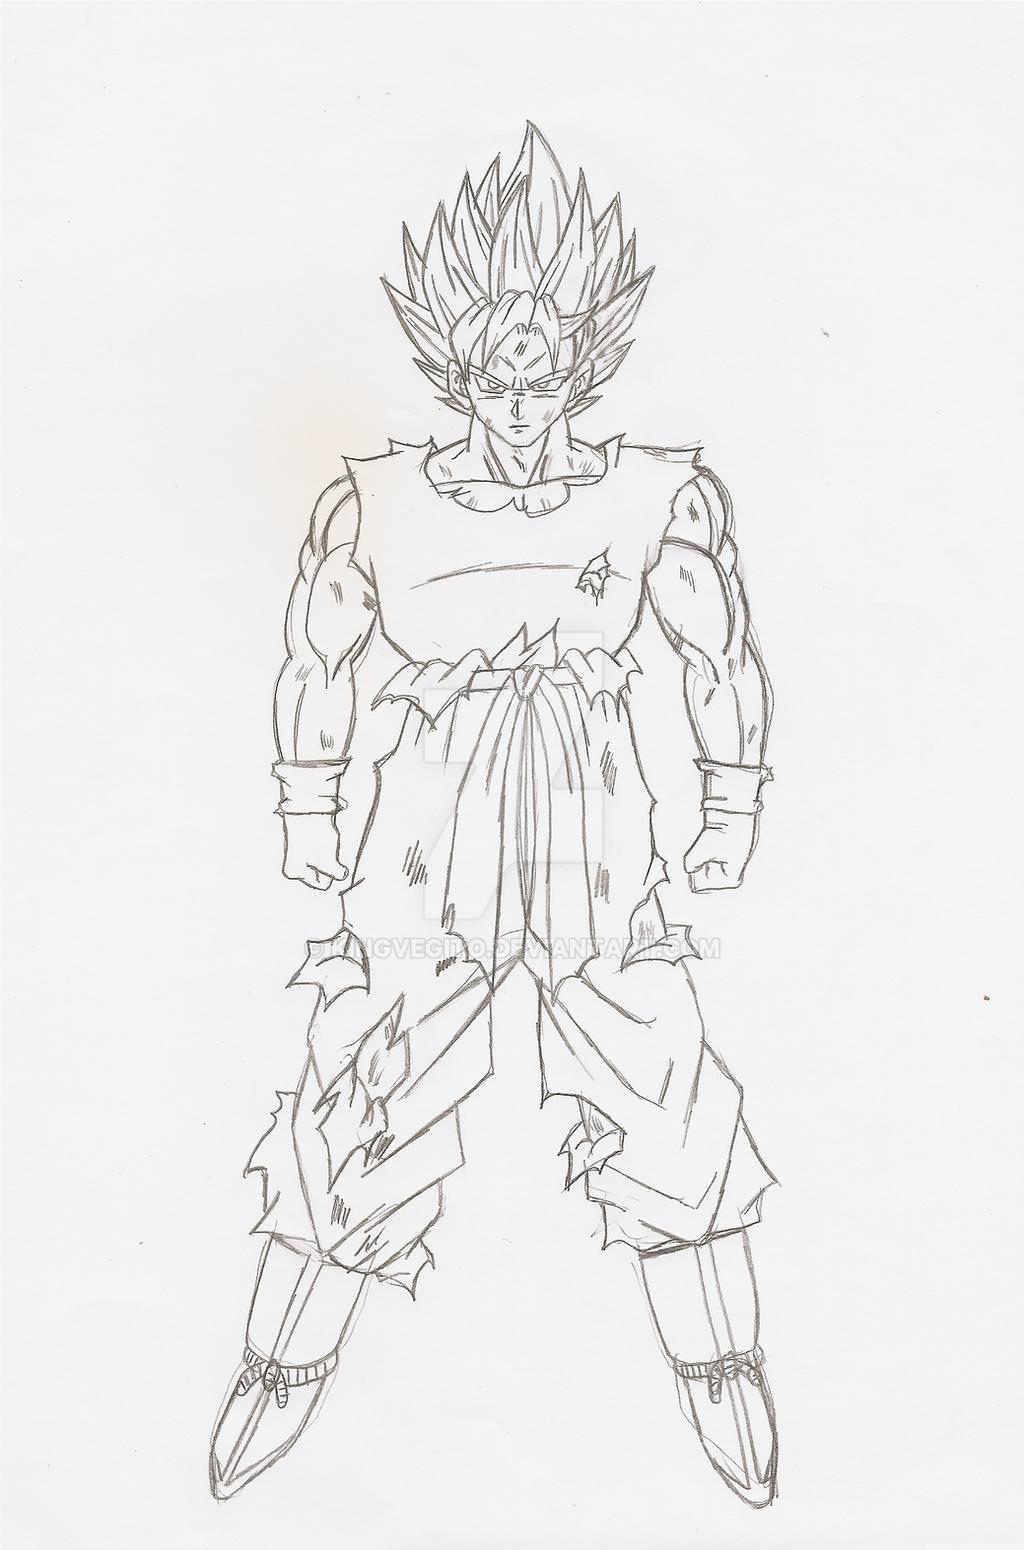 goku full body ssj lineart sketch by kingvegito on deviantart